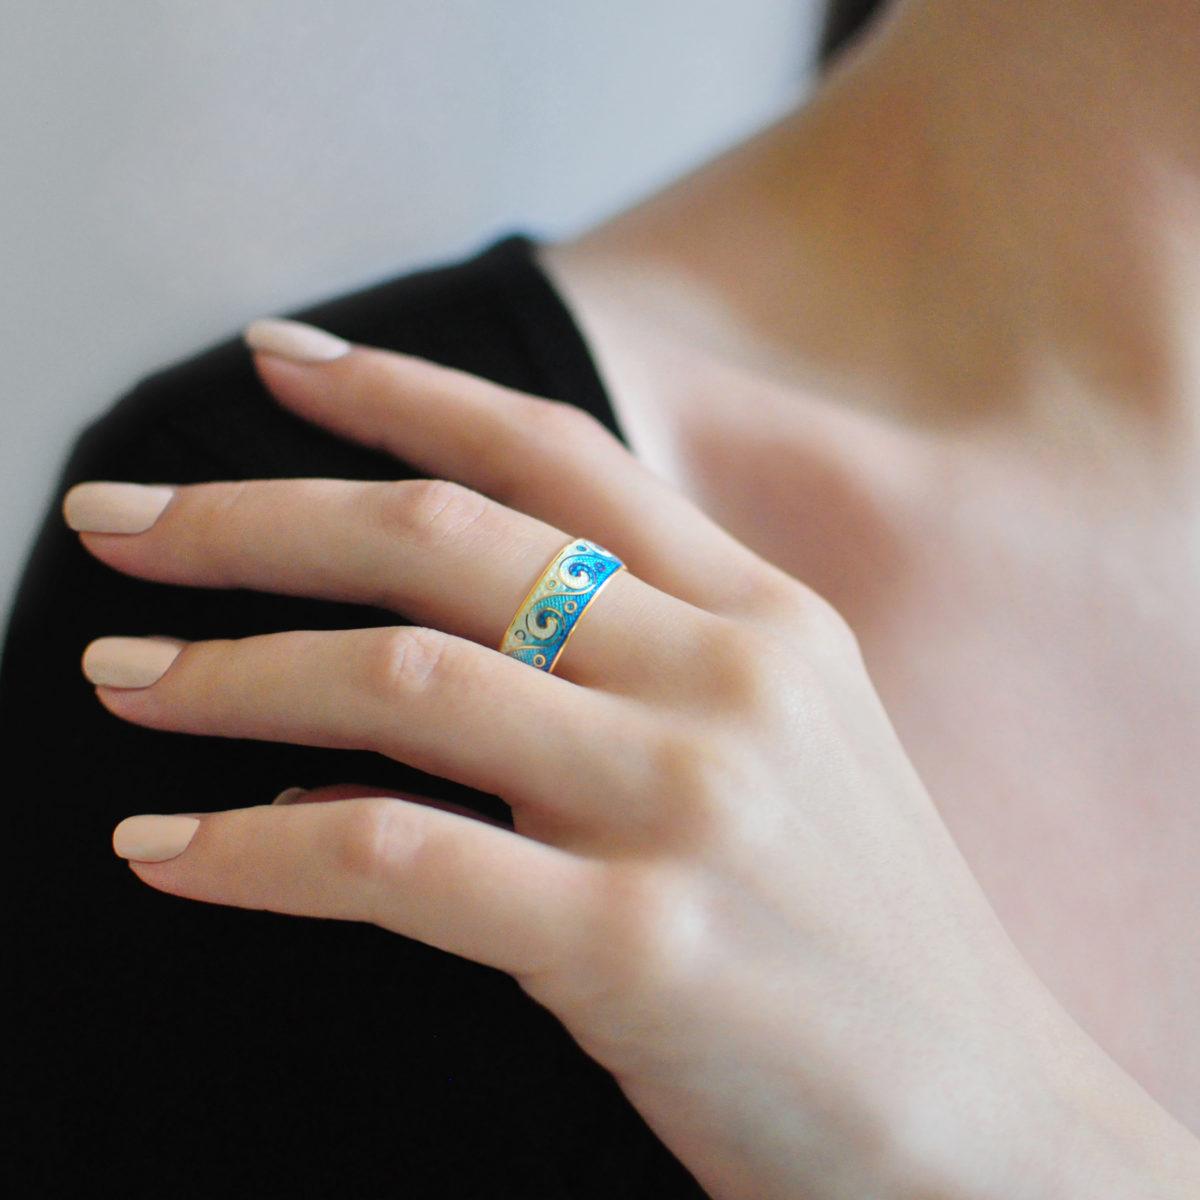 Zolochenie sinyaya 12 1200x1200 - Кольцо из серебра «Меандр» (золочение), синее